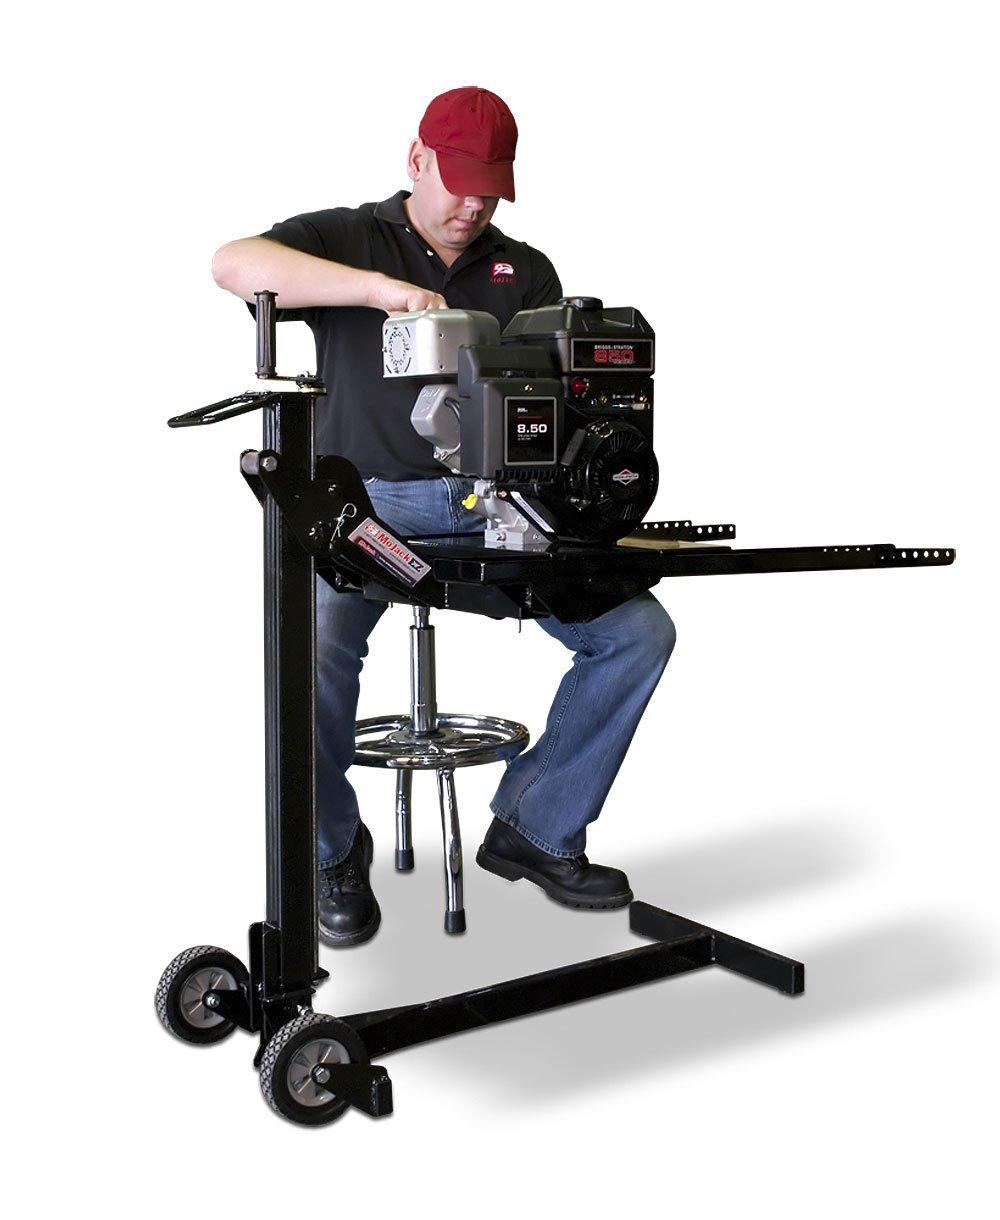 Arnold Mojack 6011-MJ-0002 Lawn Mower Work Bench